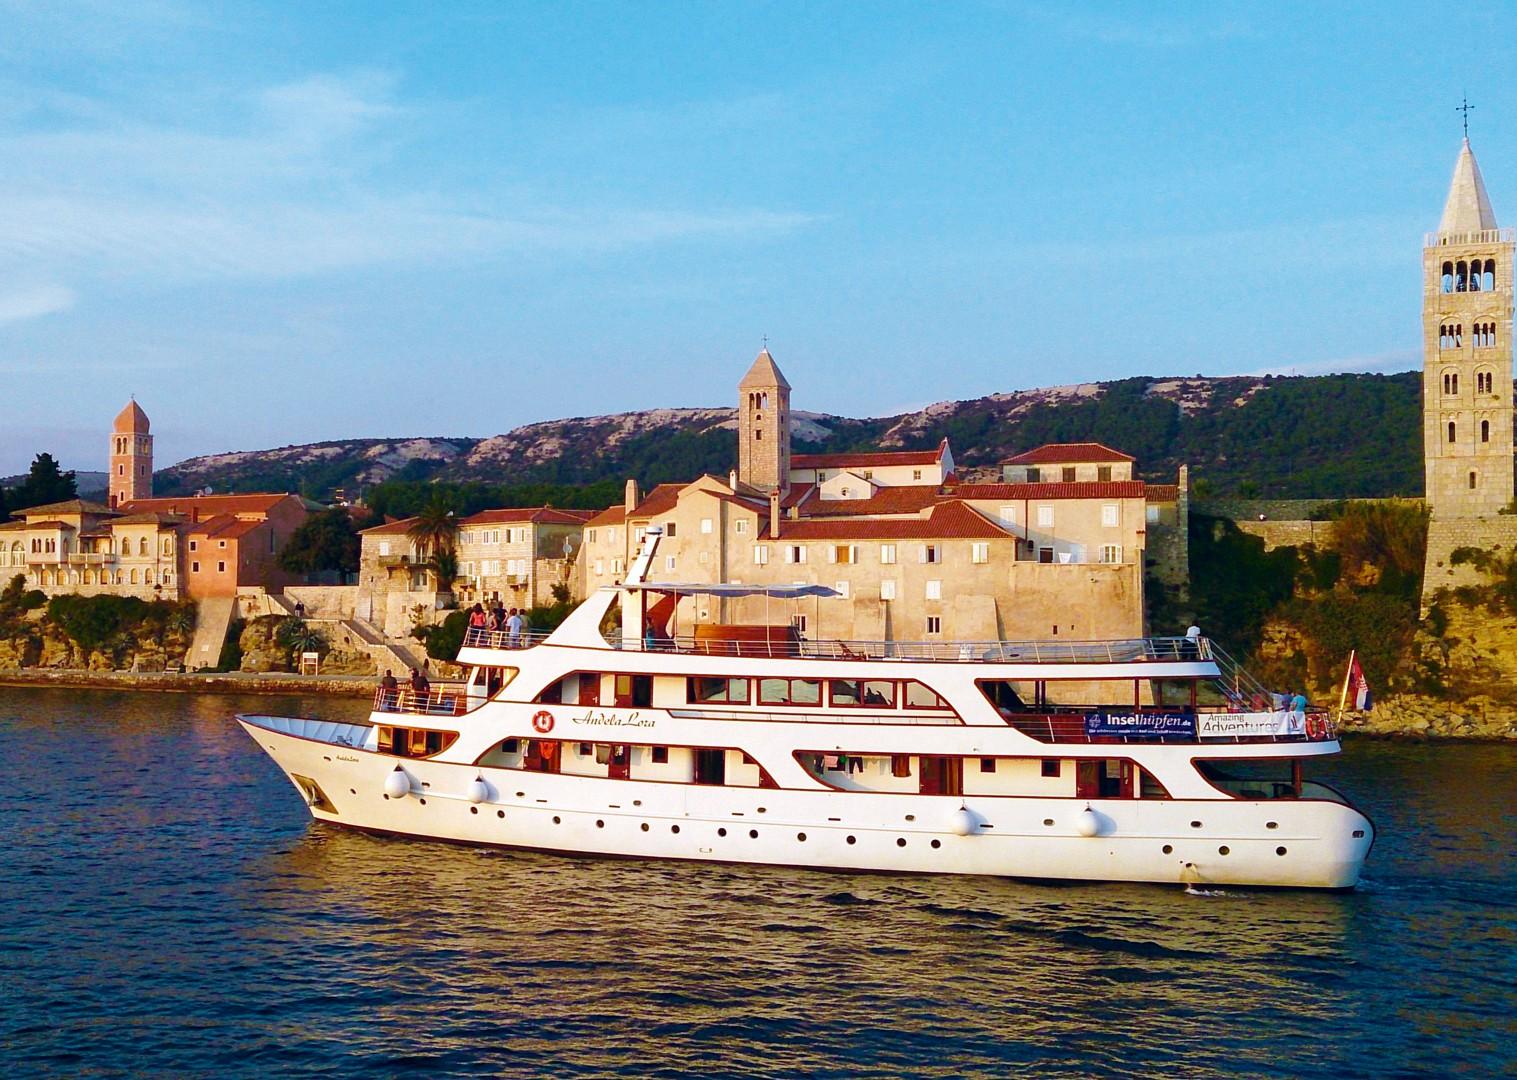 luxury-yacht-holiday-accommodation-cycle-croatia.jpg - Croatia - Kvarner Bay - Bike and Boat Holiday - Leisure Cycling